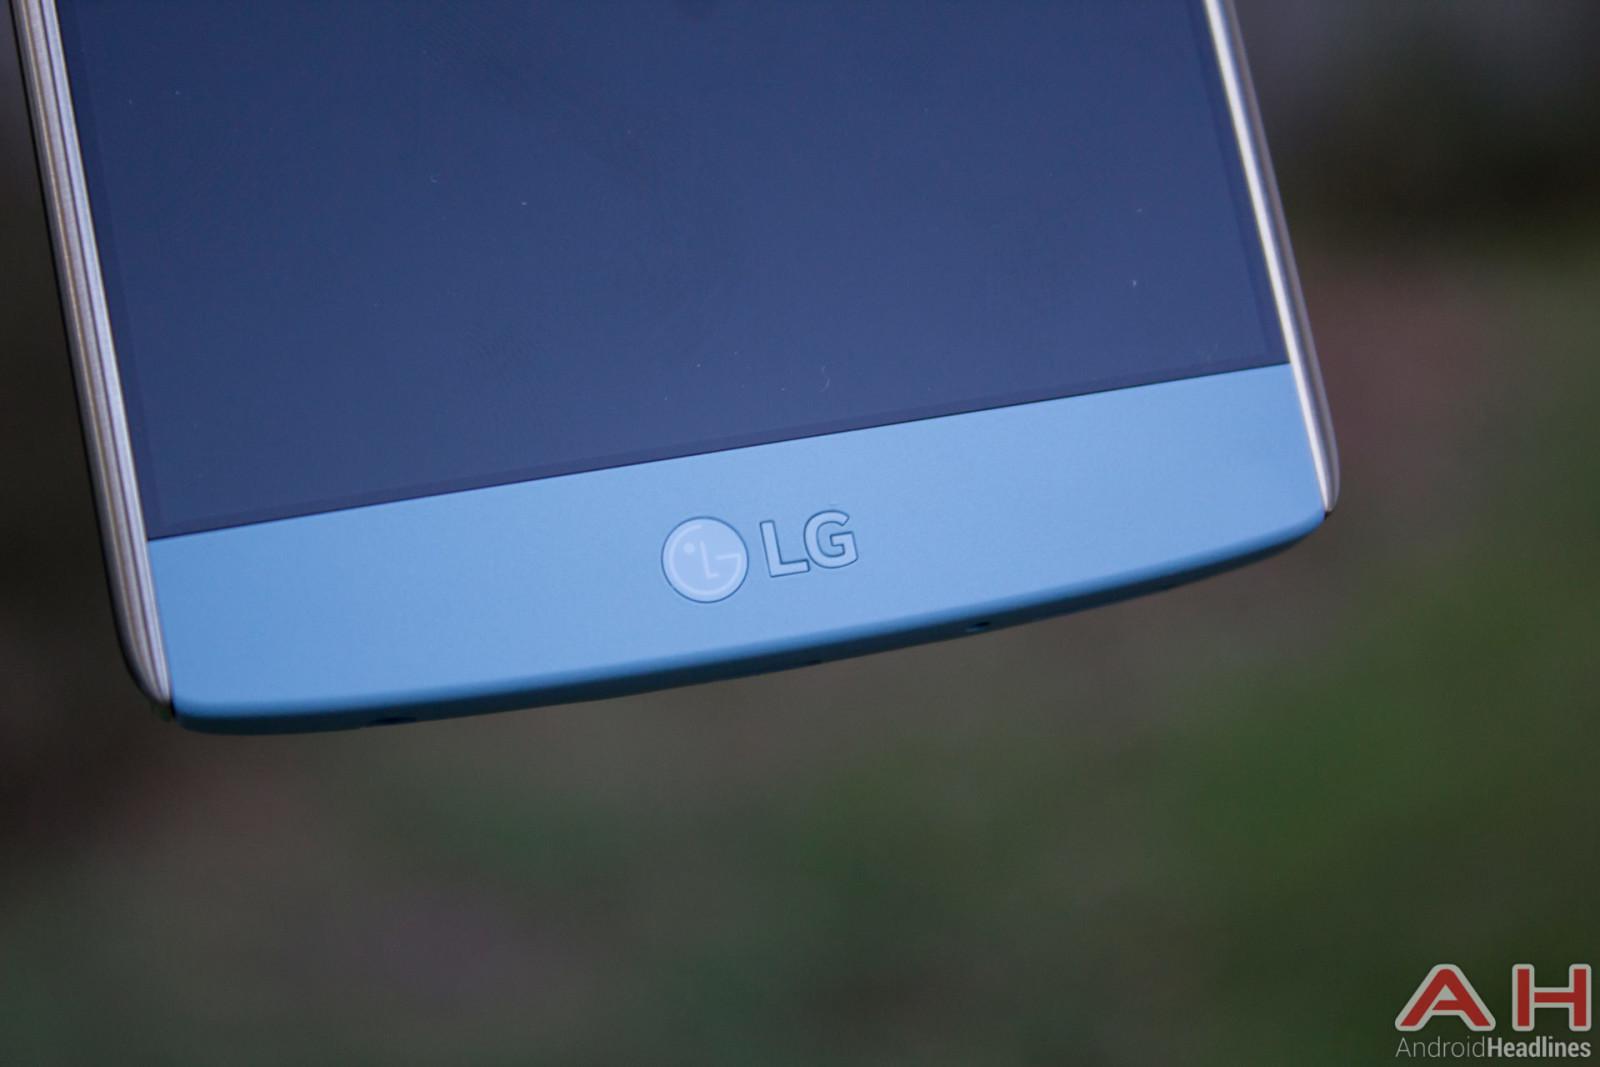 0-LG G5